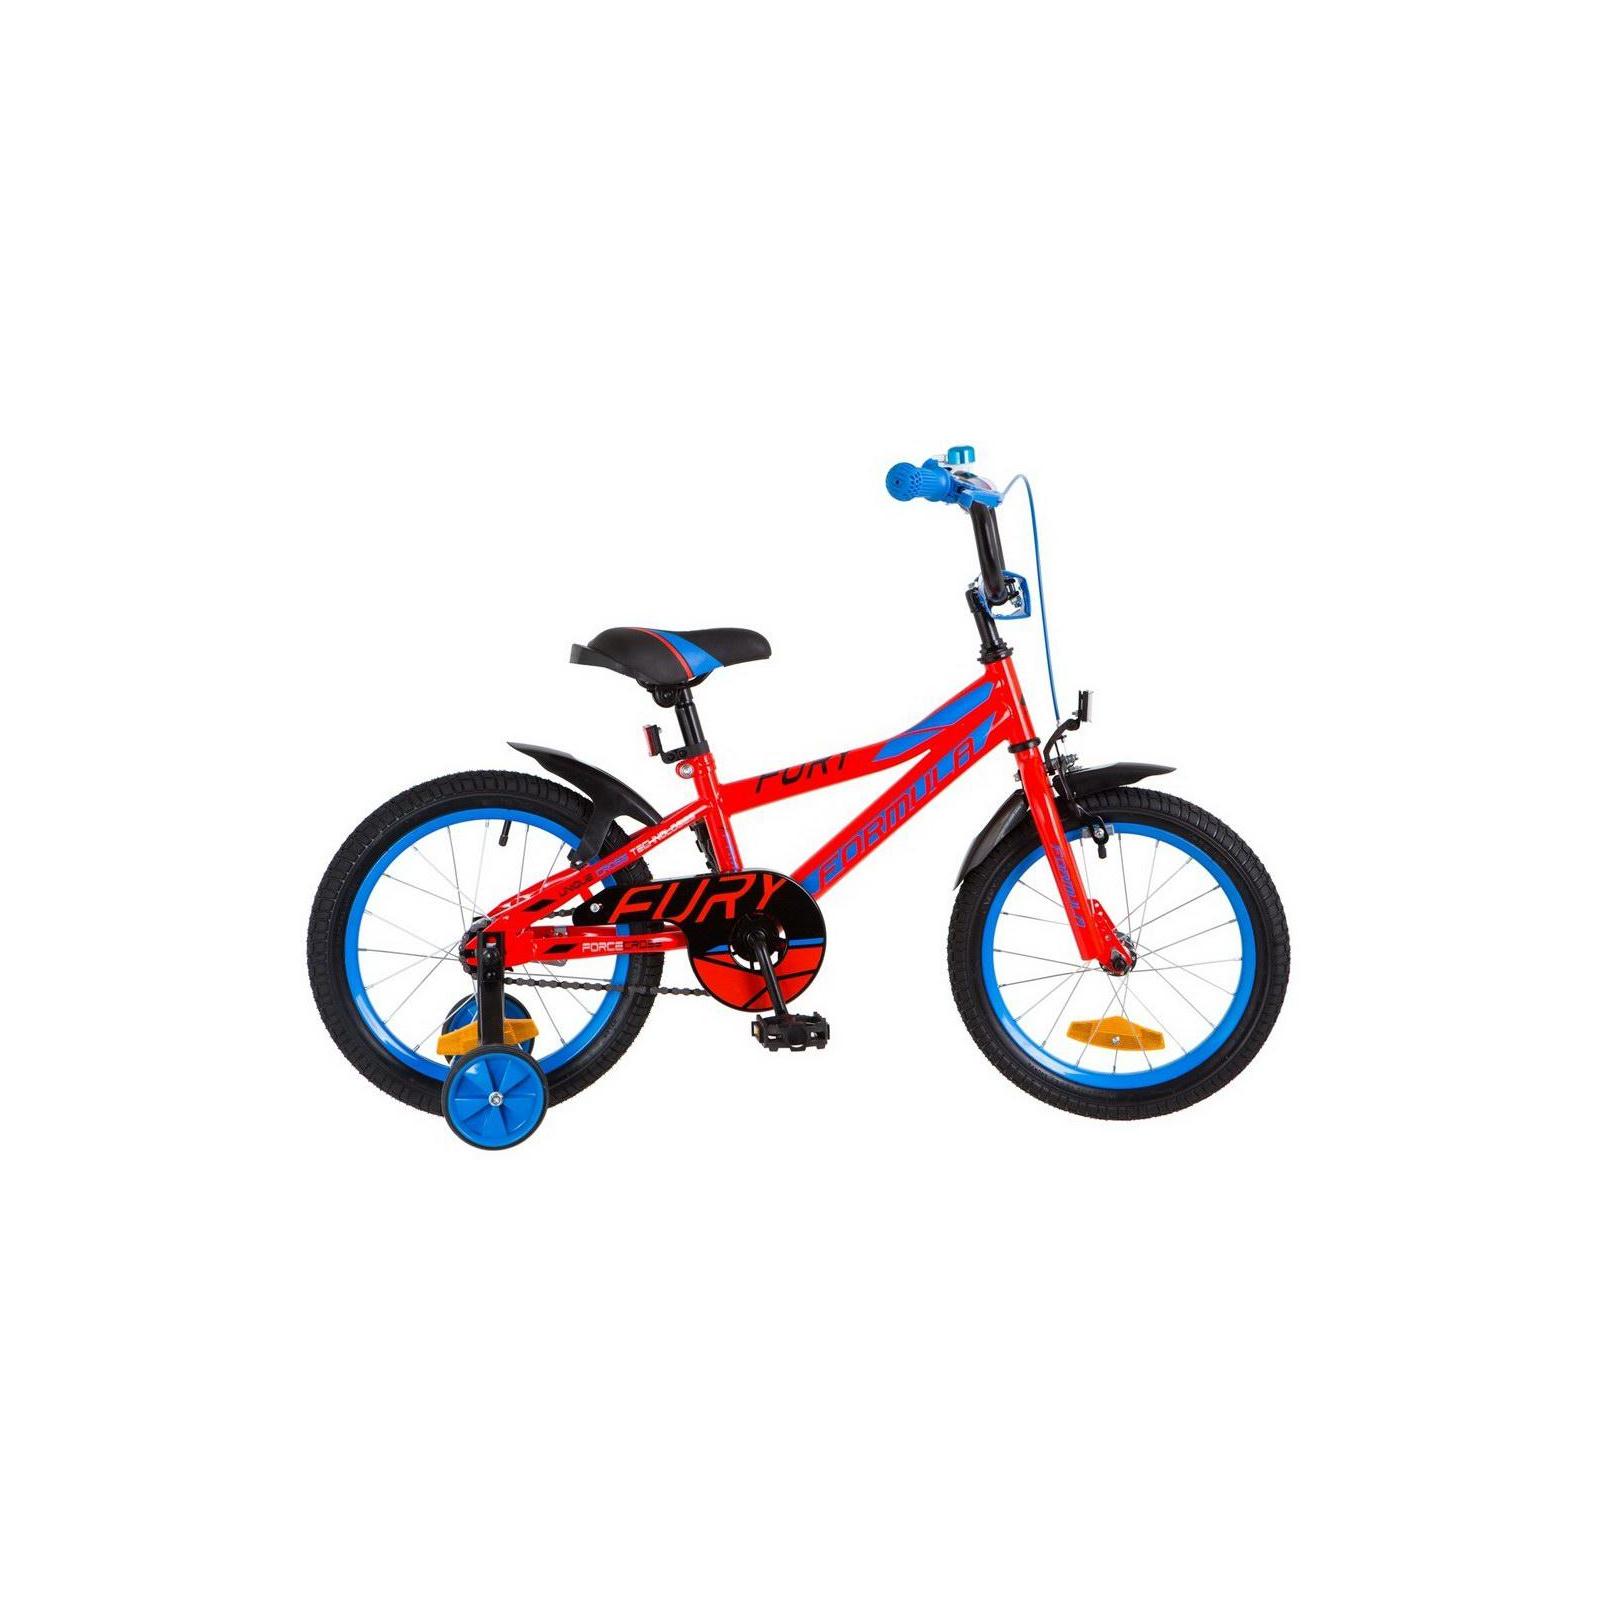 "Детский велосипед Formula 16"" FURY 2018 14G рама-8,5"" St красно-синий (OPS-FRK-16-052)"